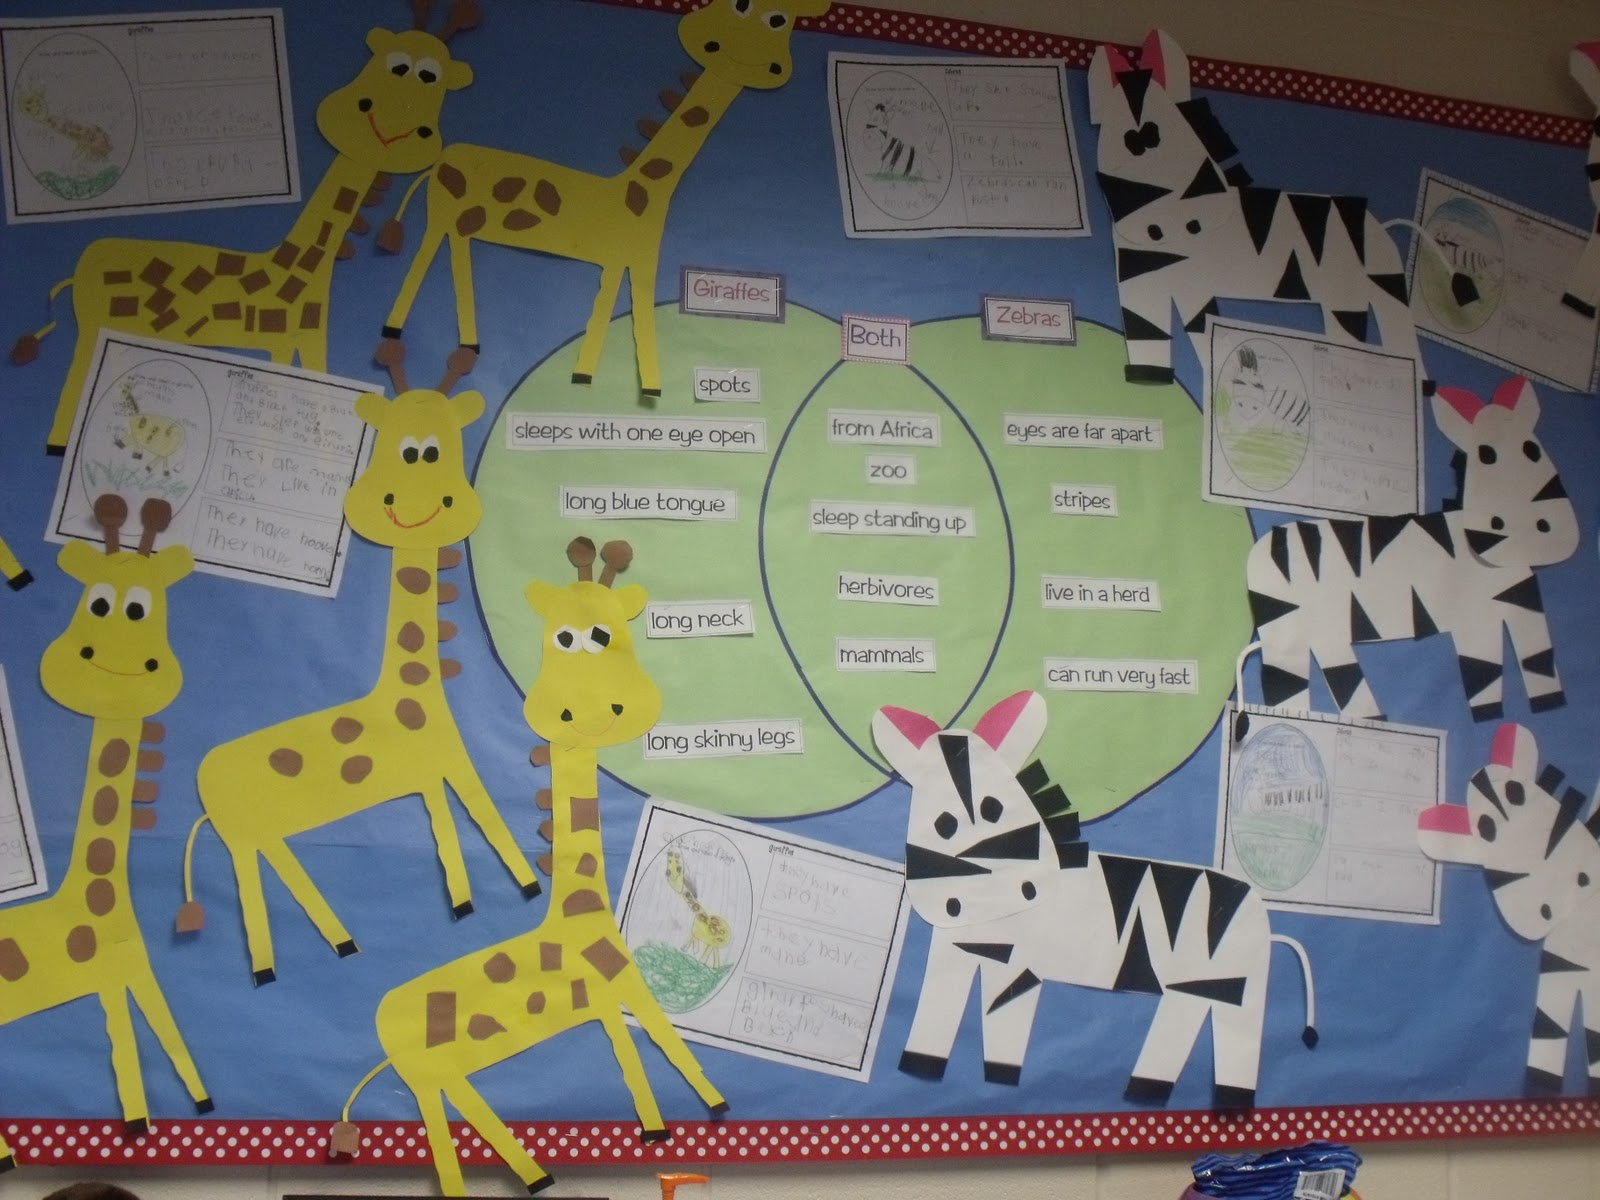 Venn Diagram Bulletin Board 2002 Dodge Ram 1500 Parts Zoo Unit Zebras Mrs Jump 39s Class